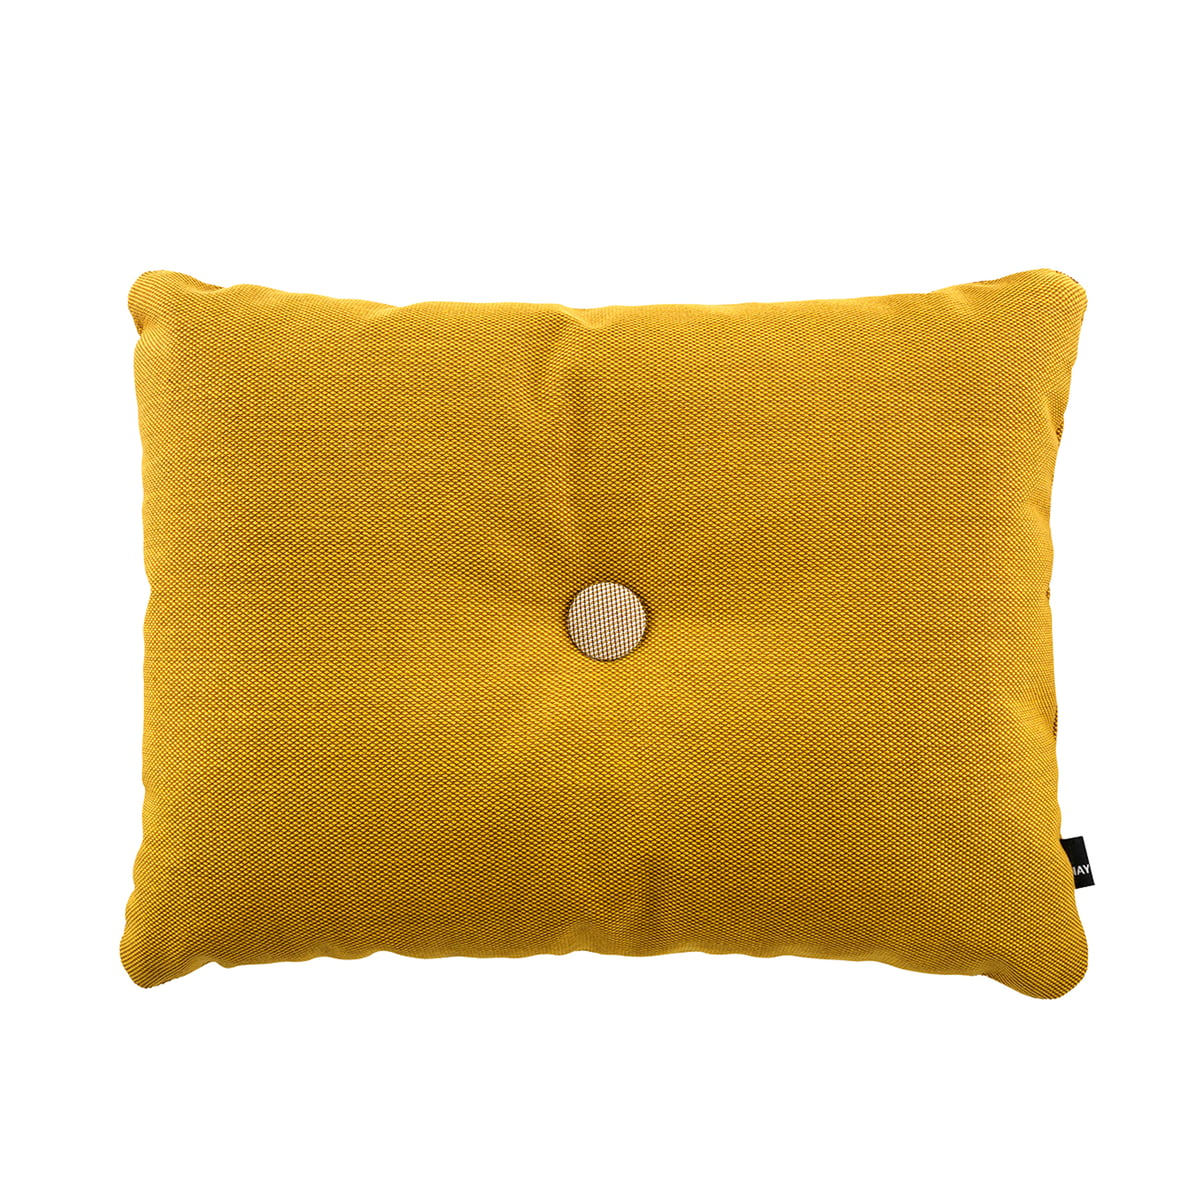 hay kissen dot 45 x 60 cm steelcut trio golden yellow 453 goldgelb h 45 b 60 online kaufen. Black Bedroom Furniture Sets. Home Design Ideas